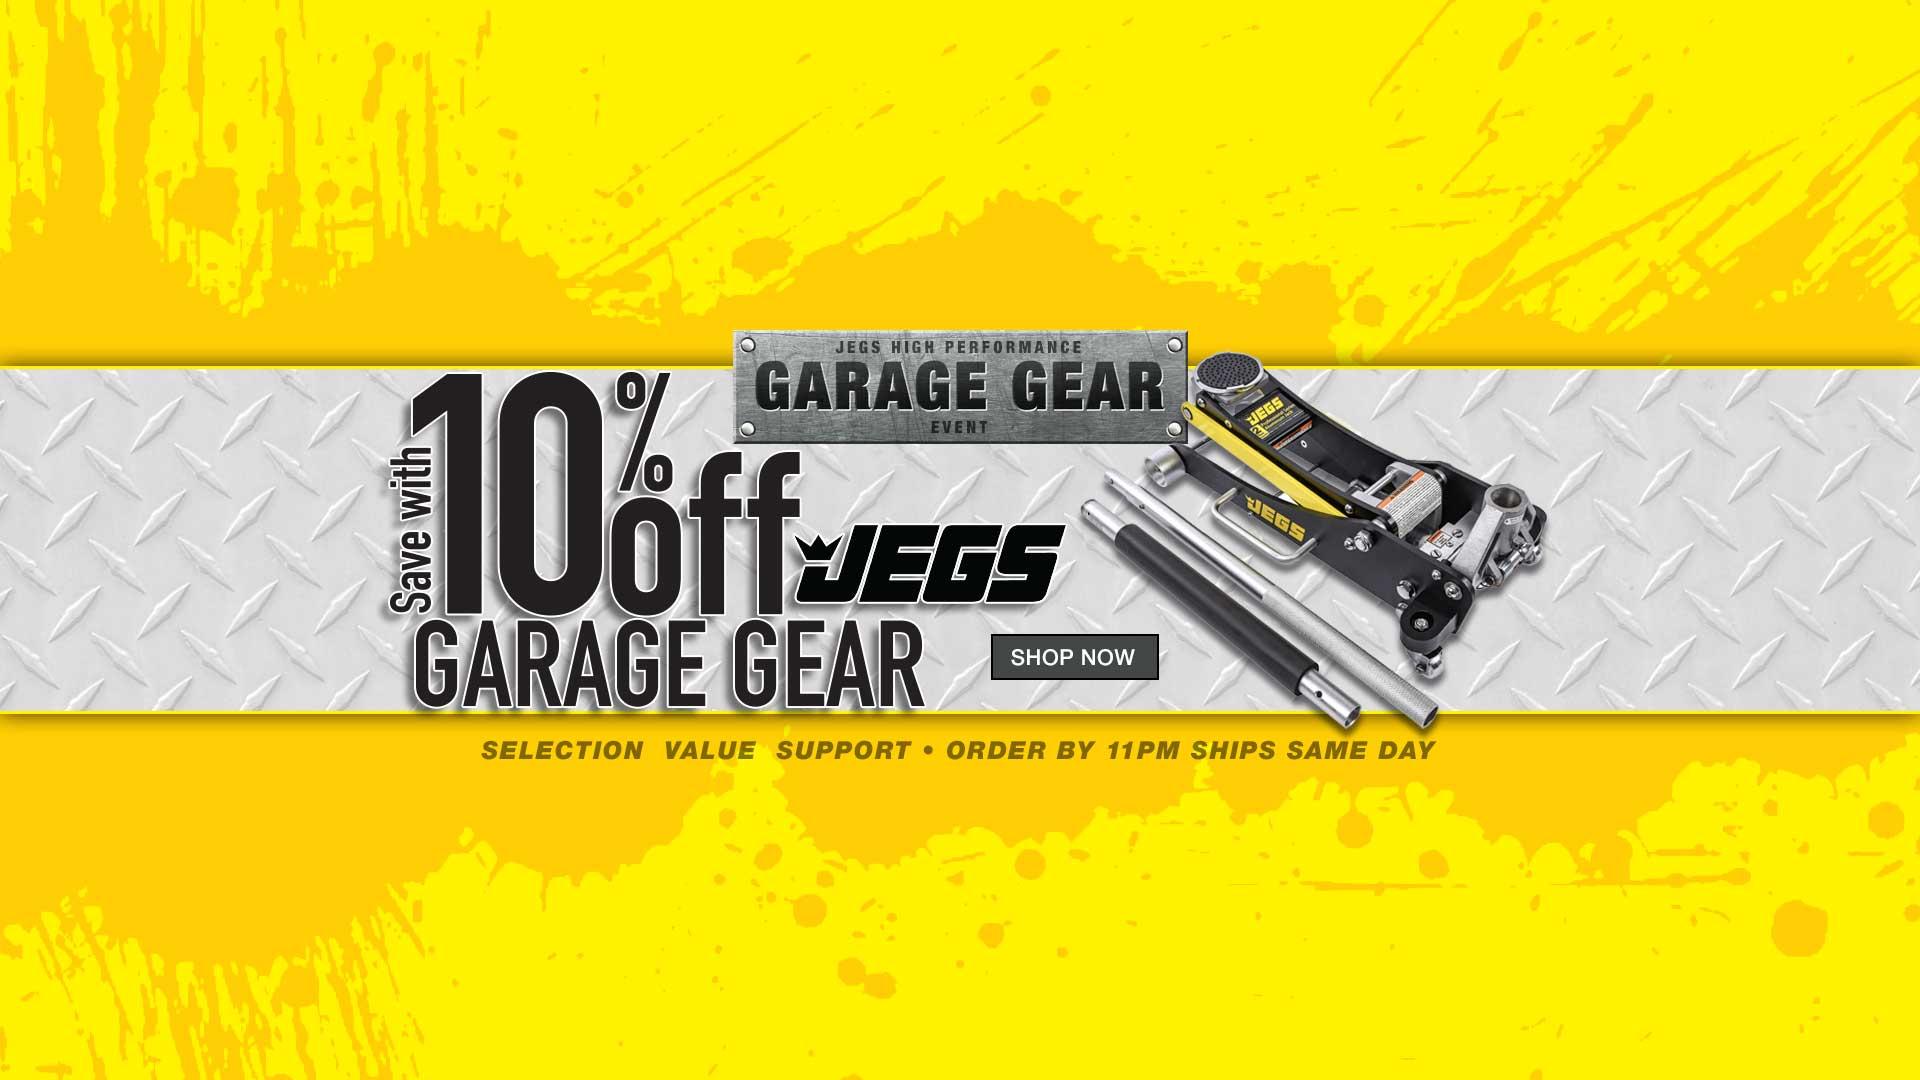 JEGS 10% off All Garage Gear